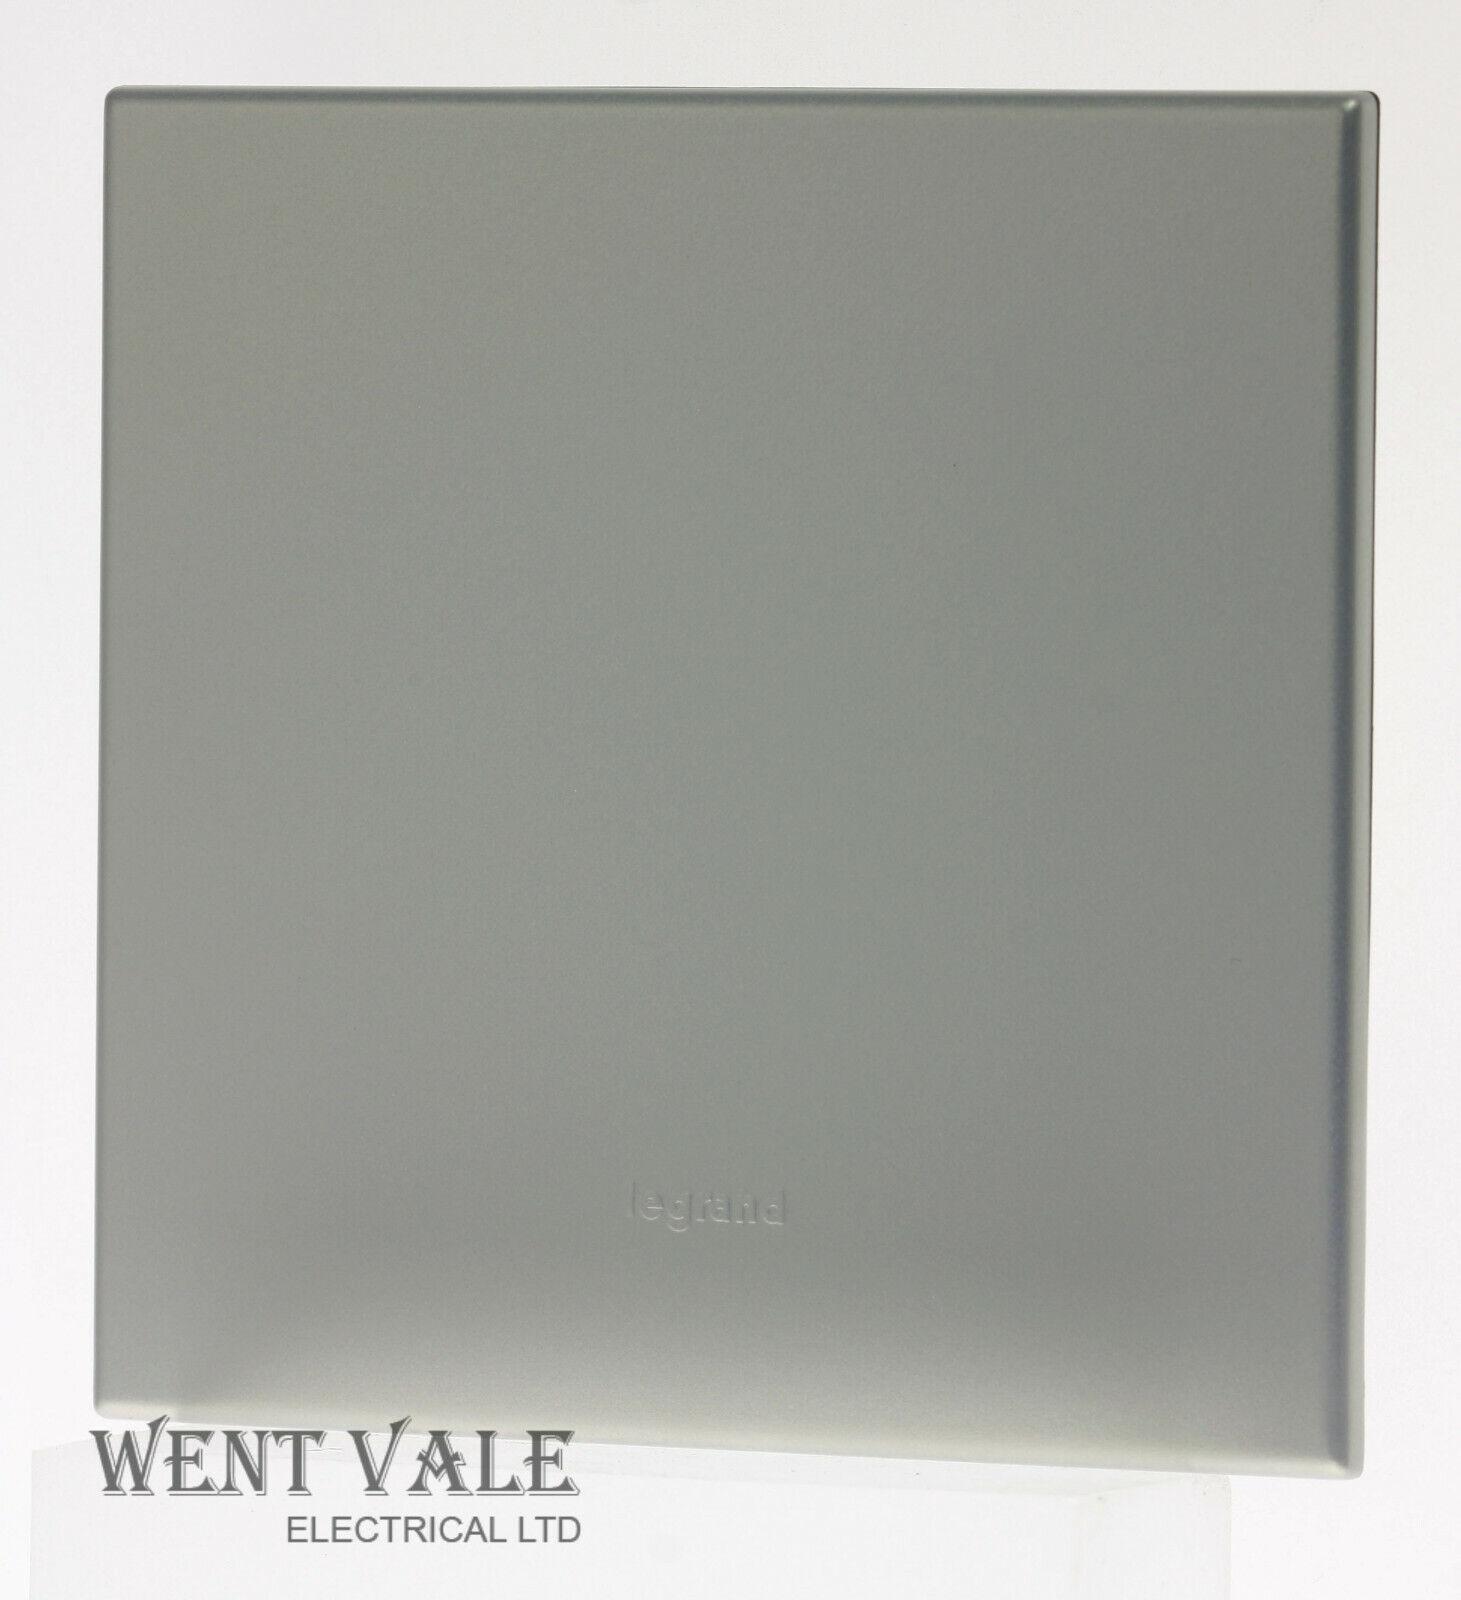 Legrand Arteor Neutral Range - 5751 31 - Pearl Aluminium 1 Gang Blank Cover Plate